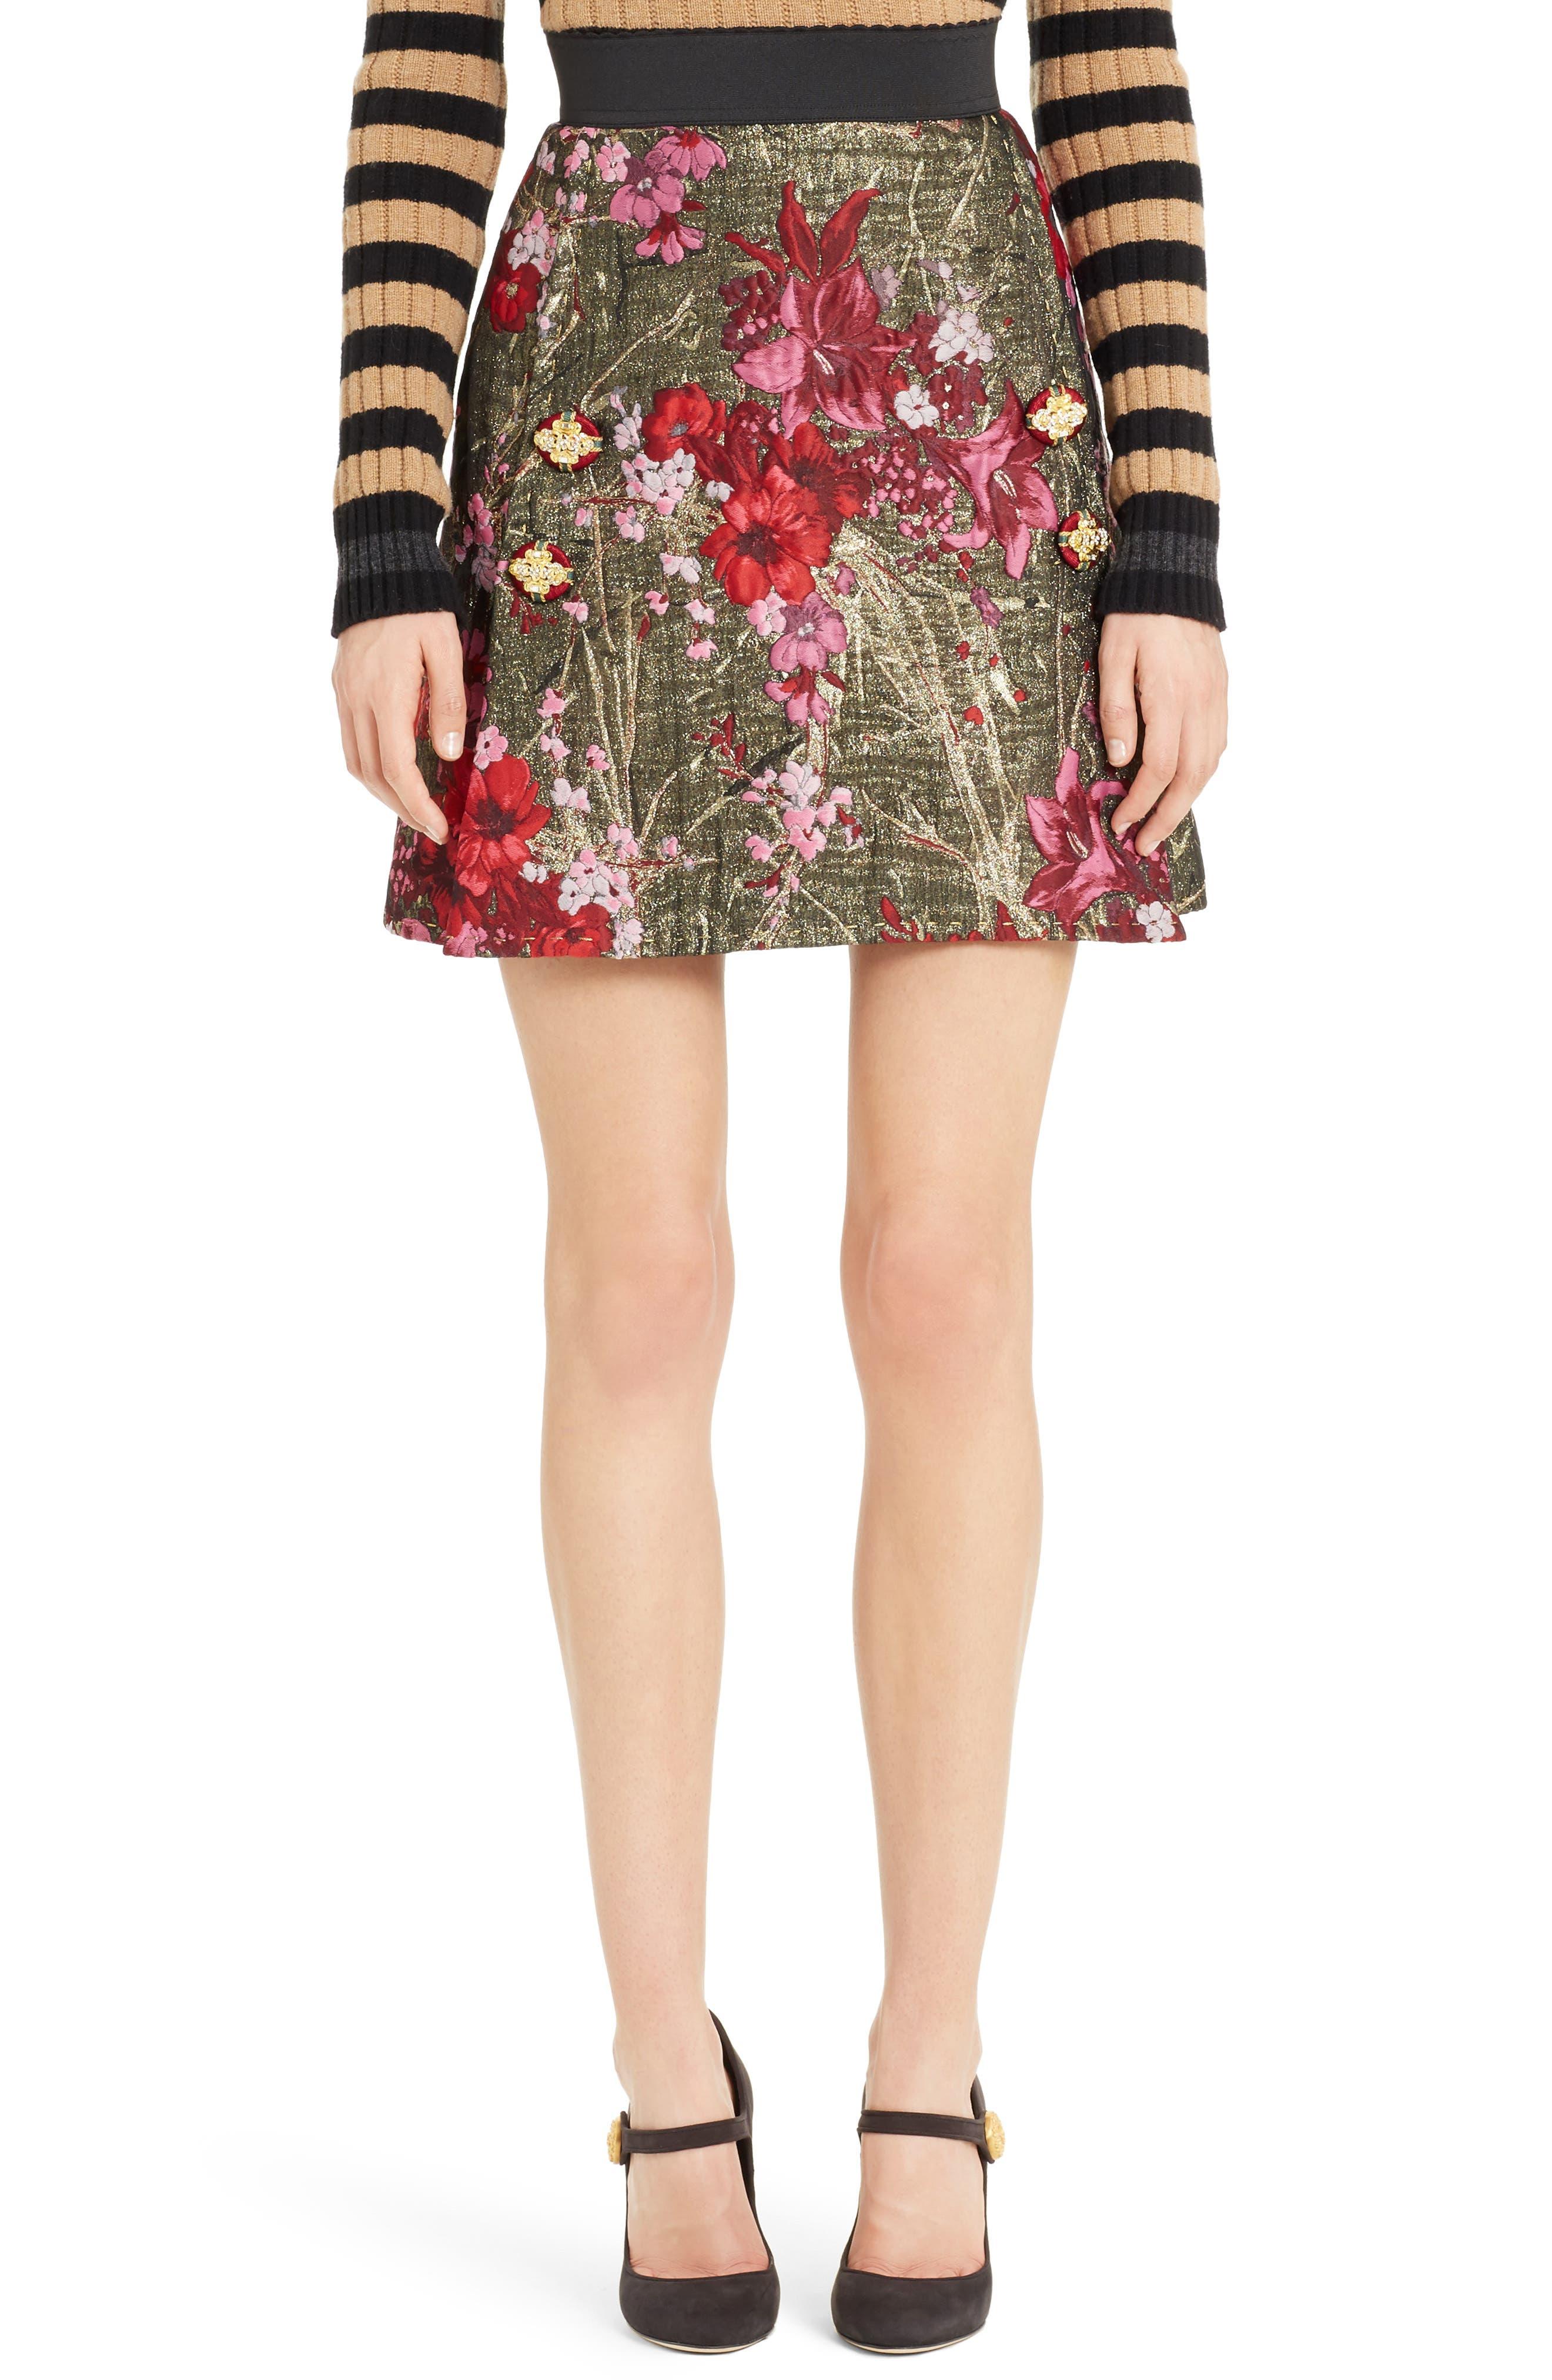 Dolce&Gabbana Metallic Jacquard Miniskirt